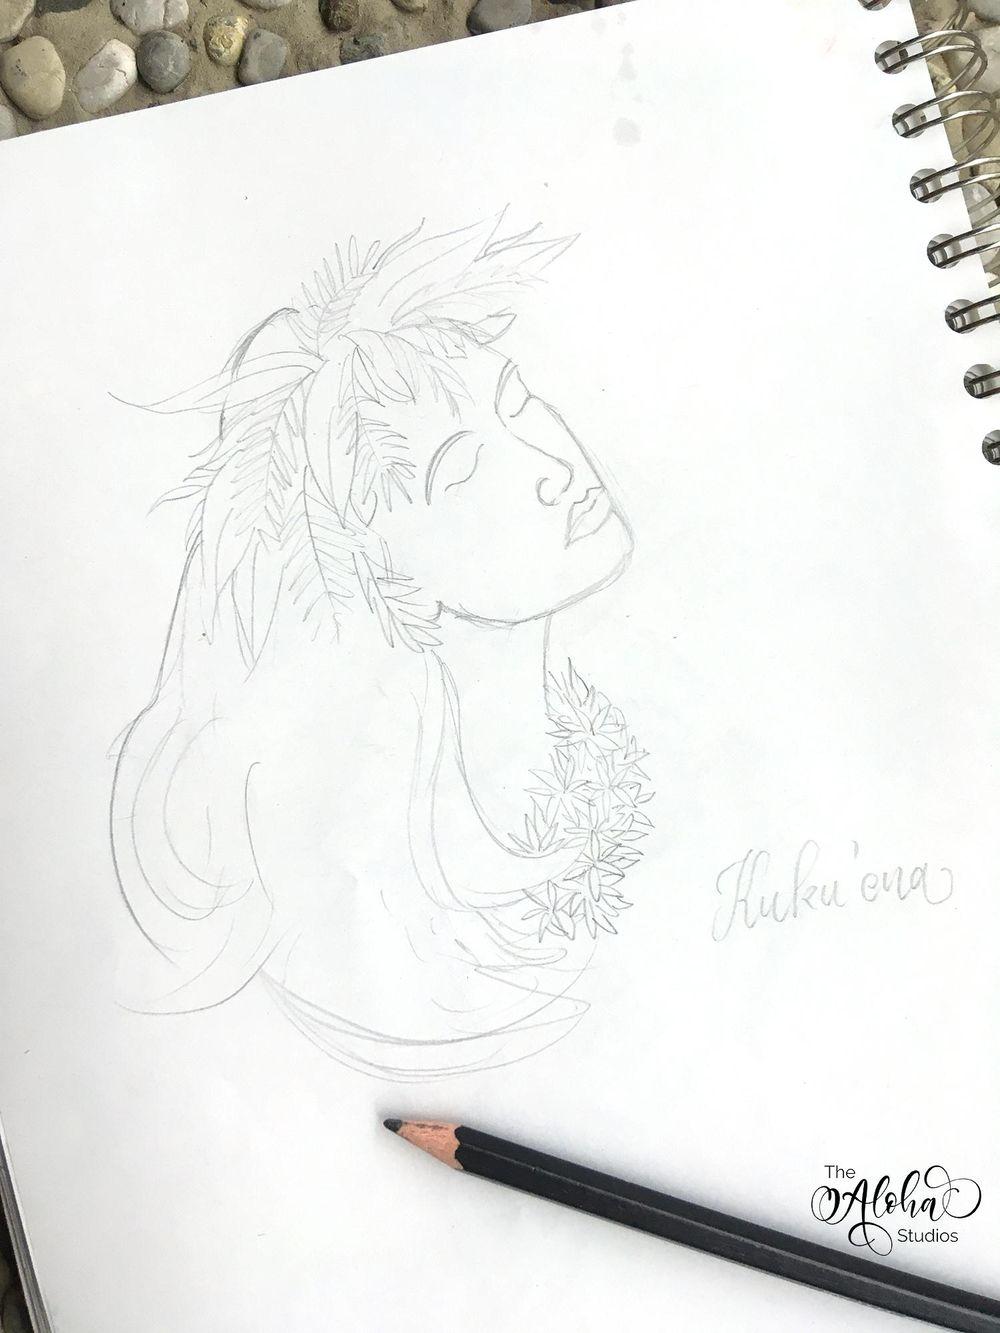 Hawaiian watercolor goddesses, work process - image 3 - student project